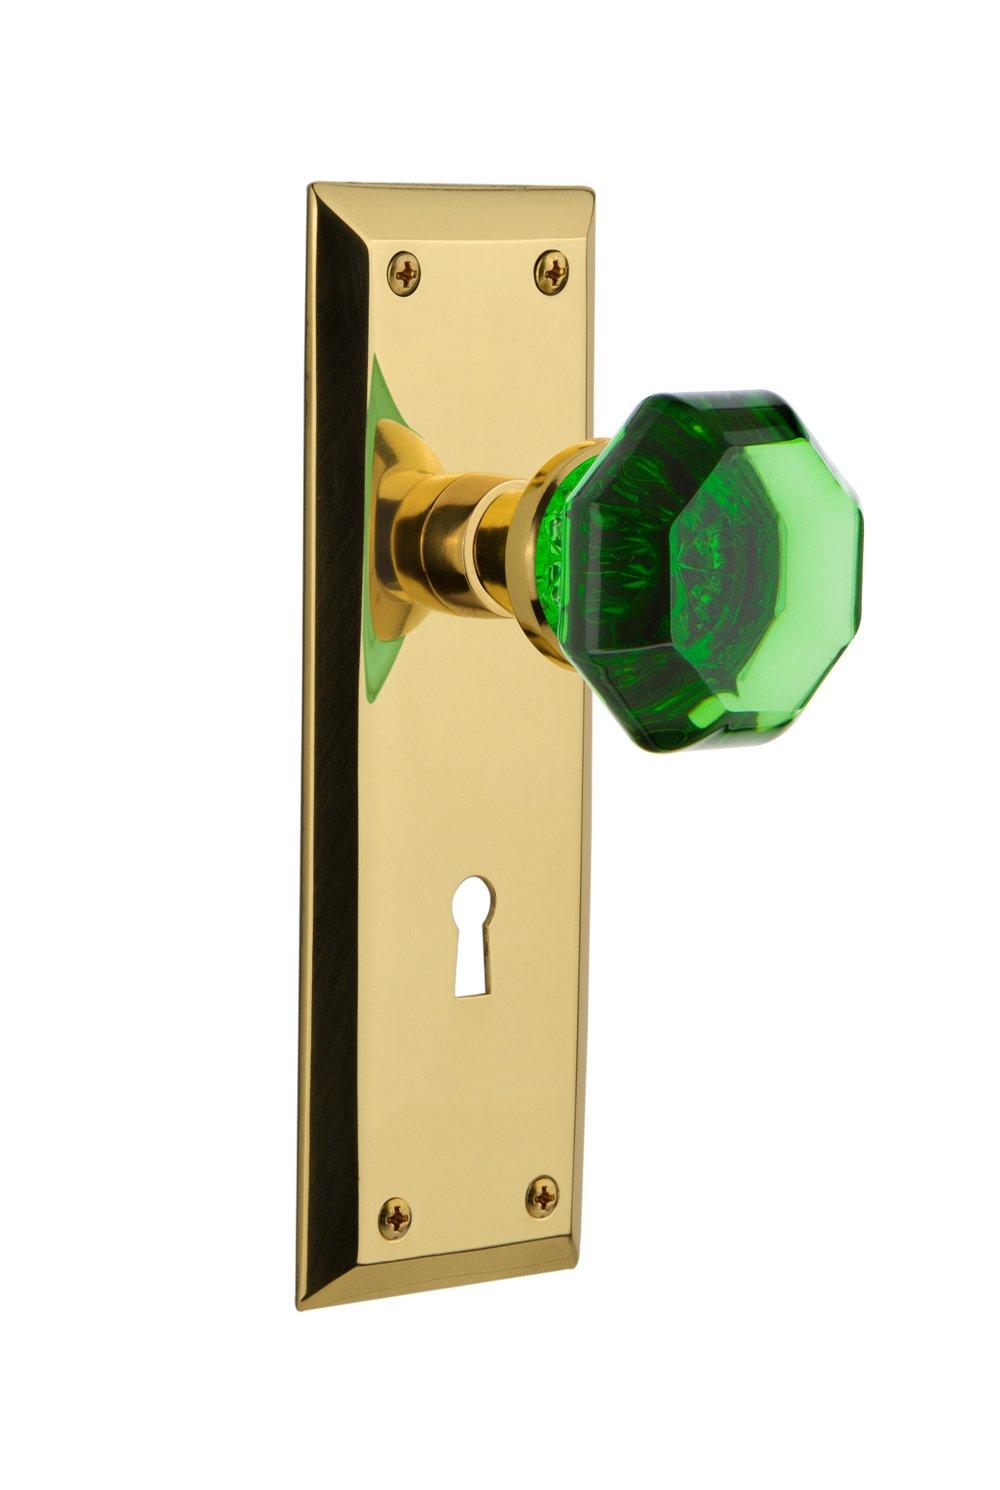 Nostalgic Warehouse 723955 New York Plate with Keyhole Double Dummy Waldorf Emerald Door Knob in Polished Brass